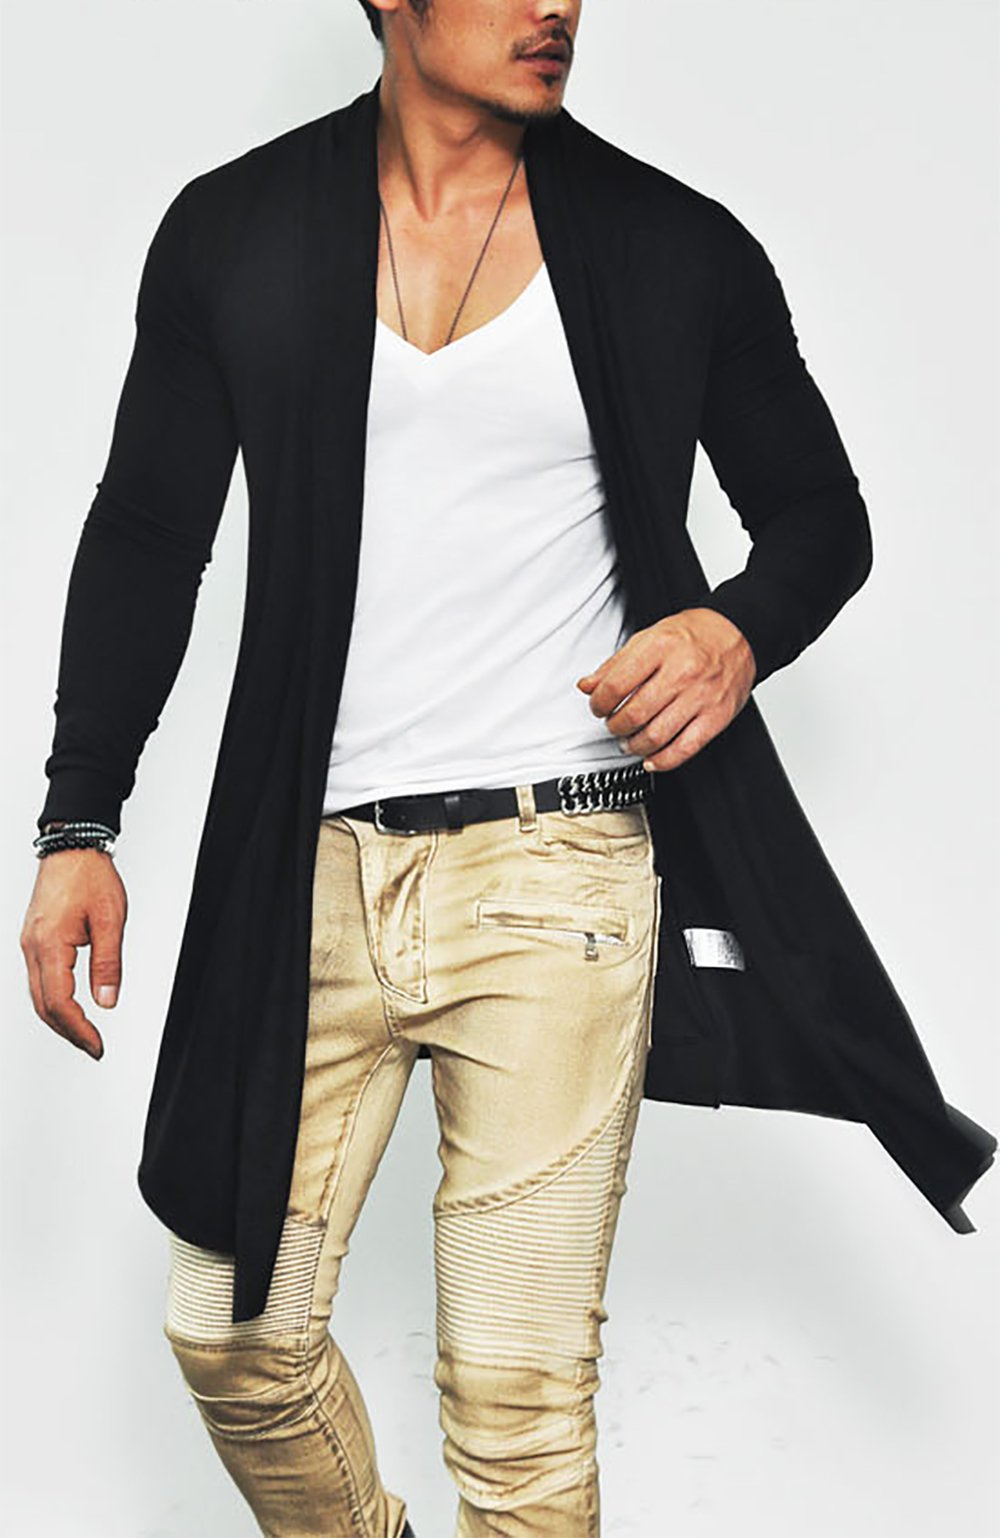 COOFANDY Men's Ruffle Shawl Collar Long Sleeves Cardigan (Medium, Black) by COOFANDY (Image #2)